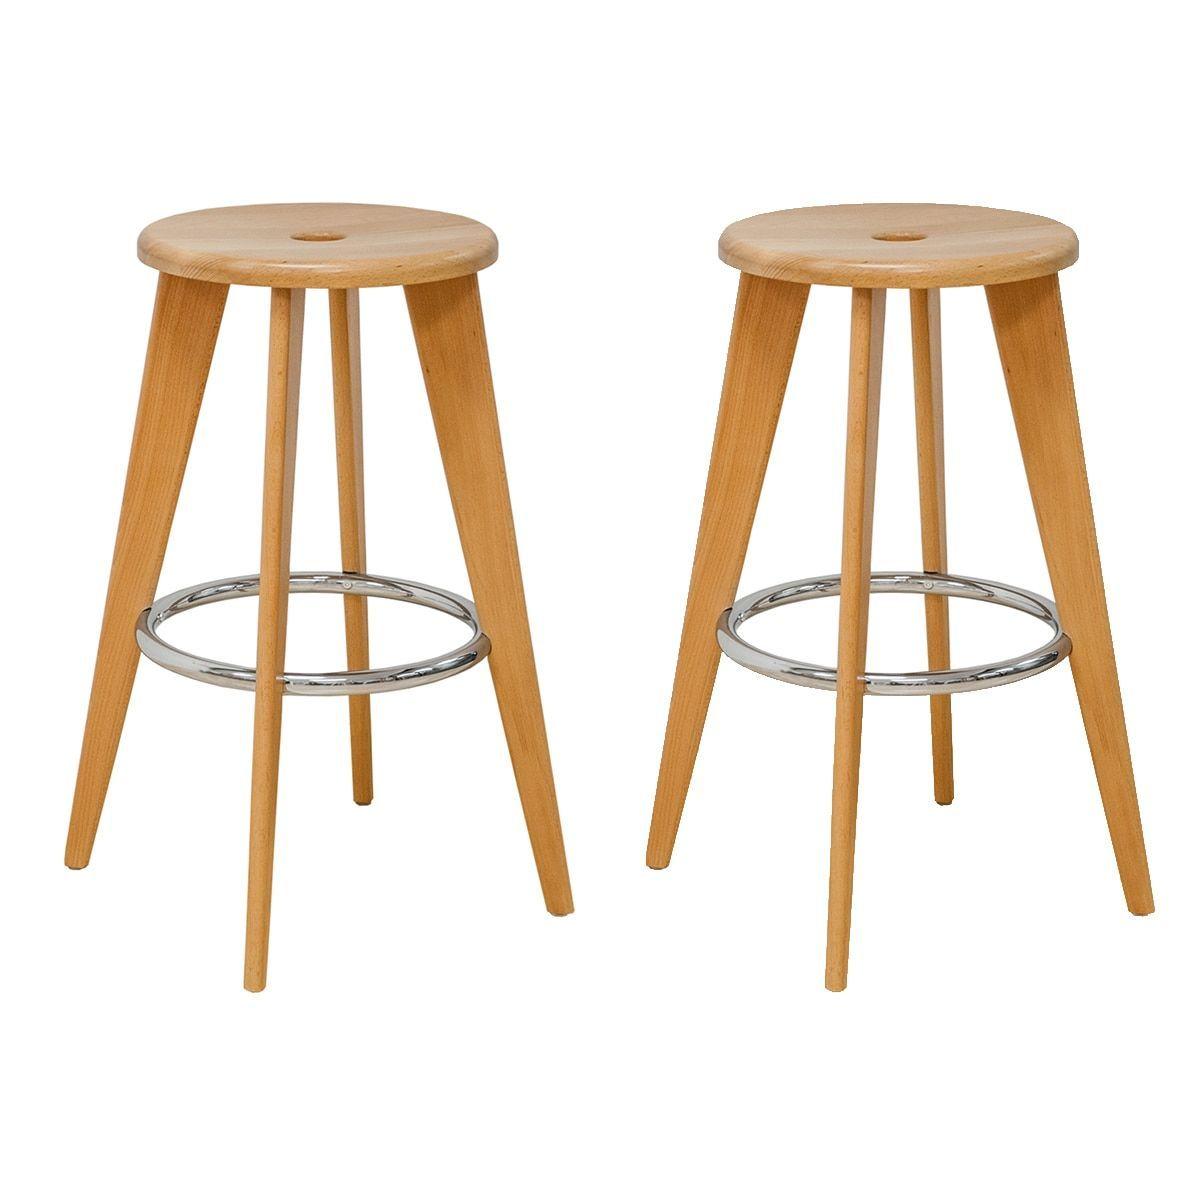 Peachy Mod Made Skylark Wooden 29 Inch High Bar Stools With Chrome Dailytribune Chair Design For Home Dailytribuneorg